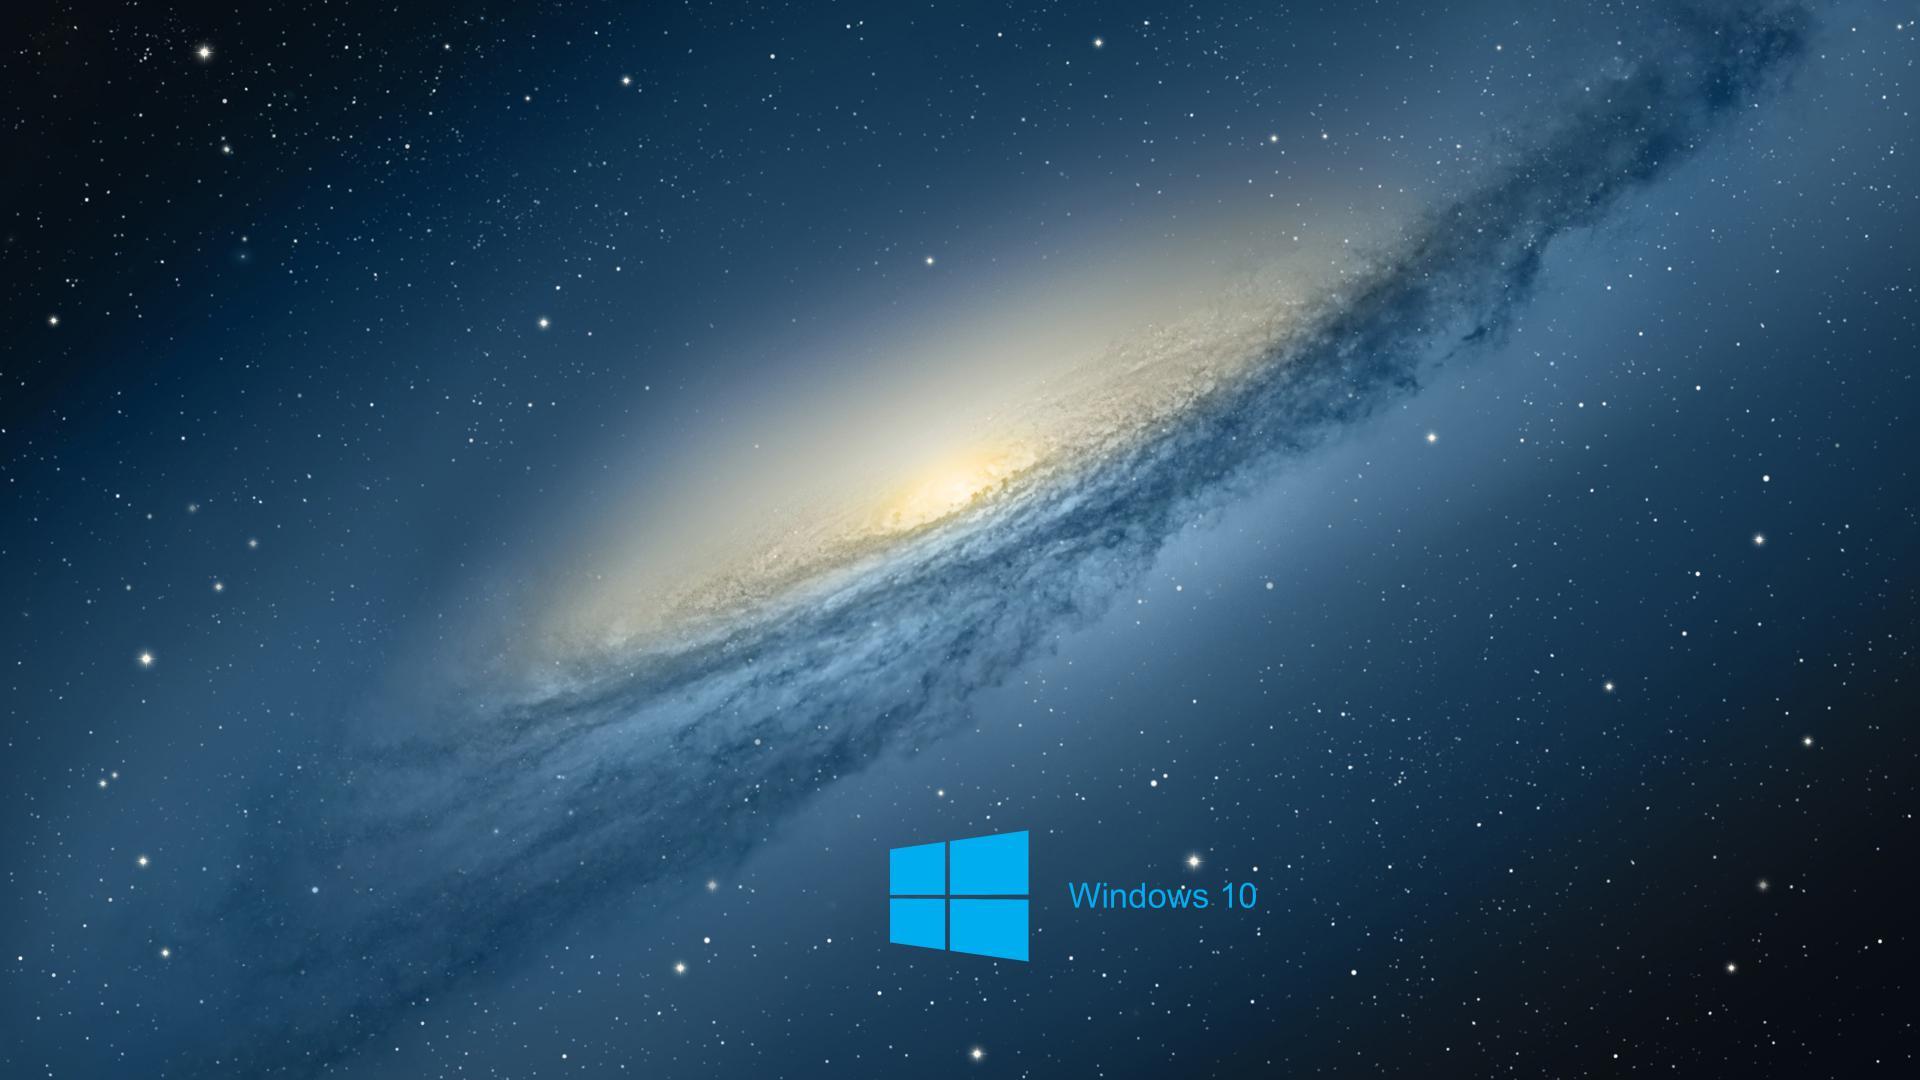 Windows 10 Wallpaper HD 4k - Supportive Guru